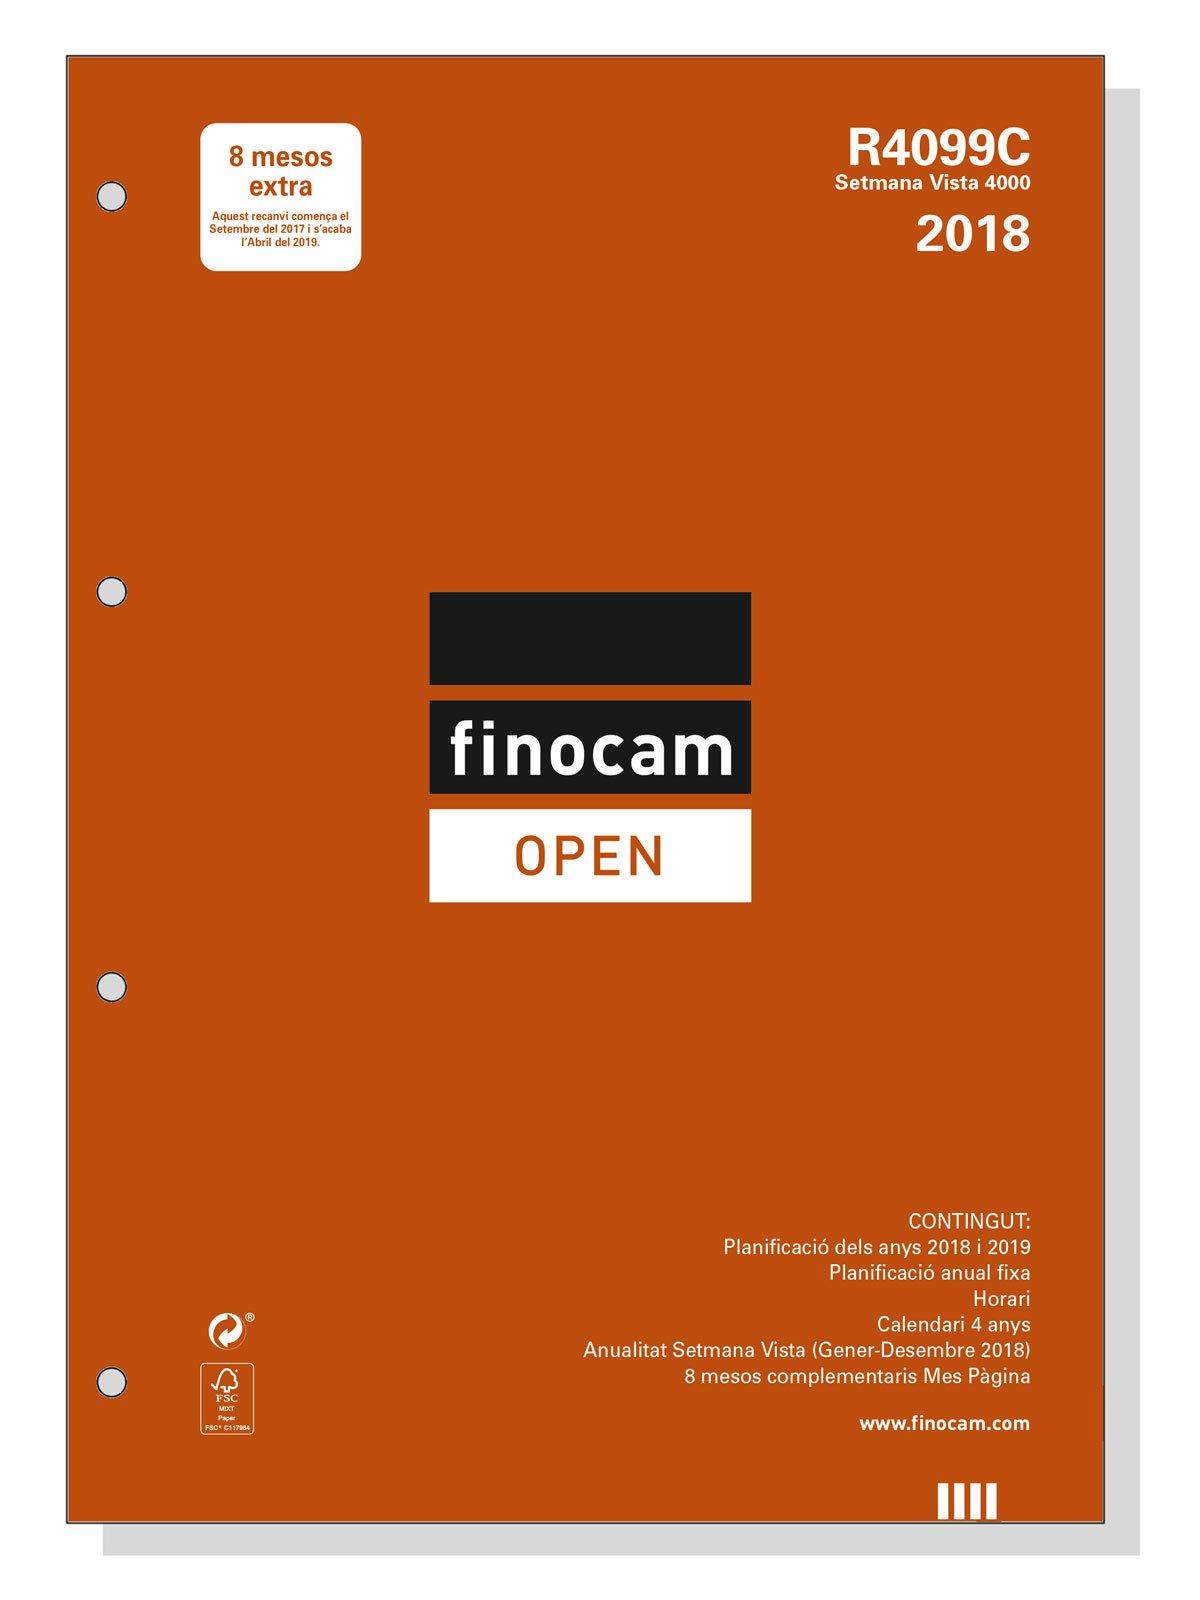 Finocam Open R4099C - Recambio anual 2018, catalán, 210 x 297 mm, 80